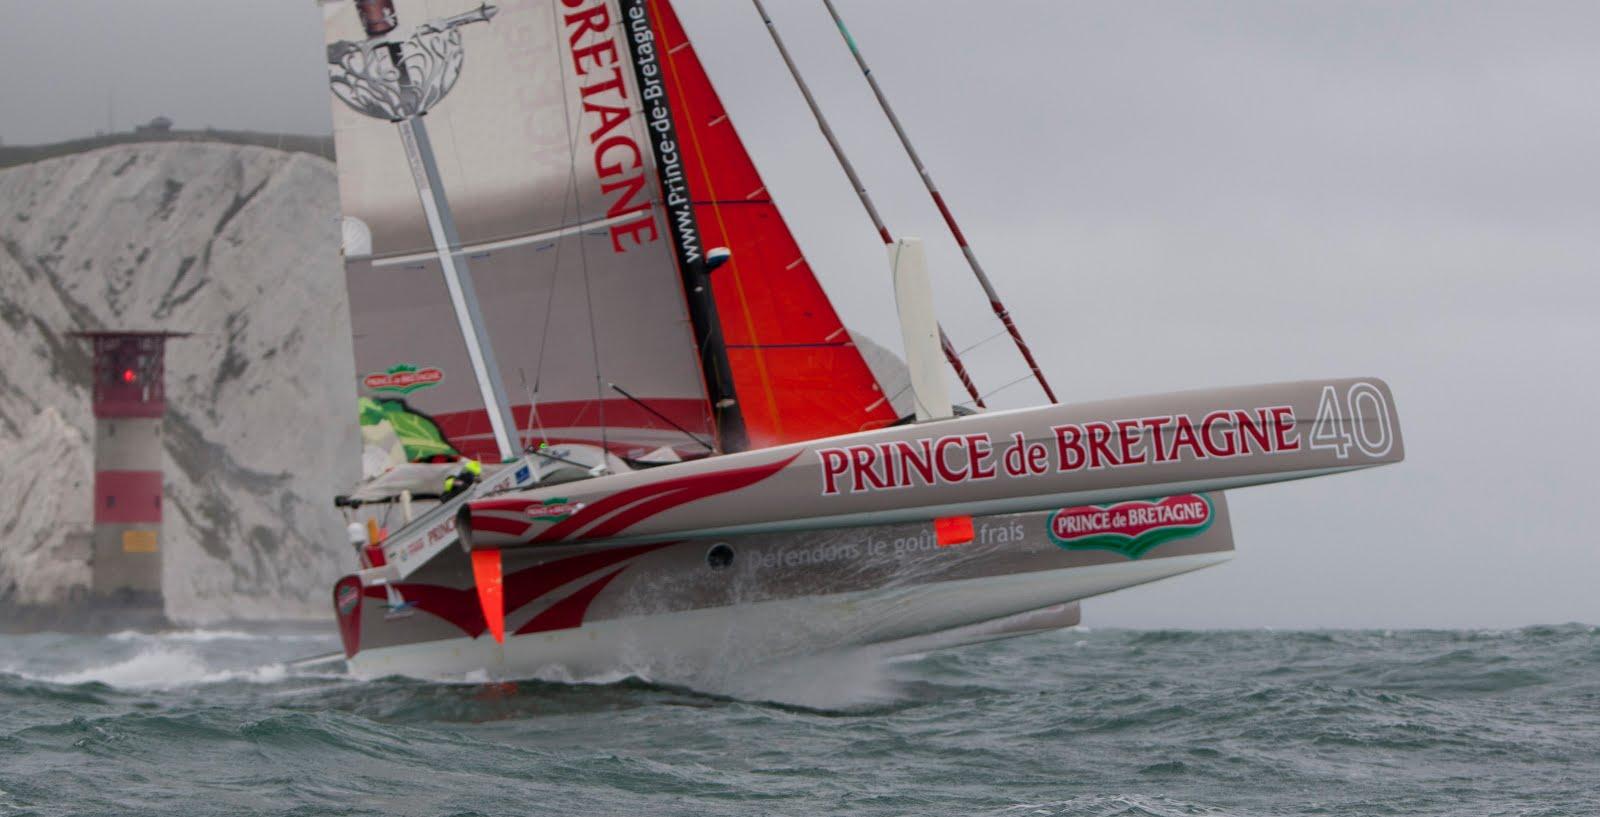 SailRaceWin: Round the Island Race : Prince de Bretagne Wins